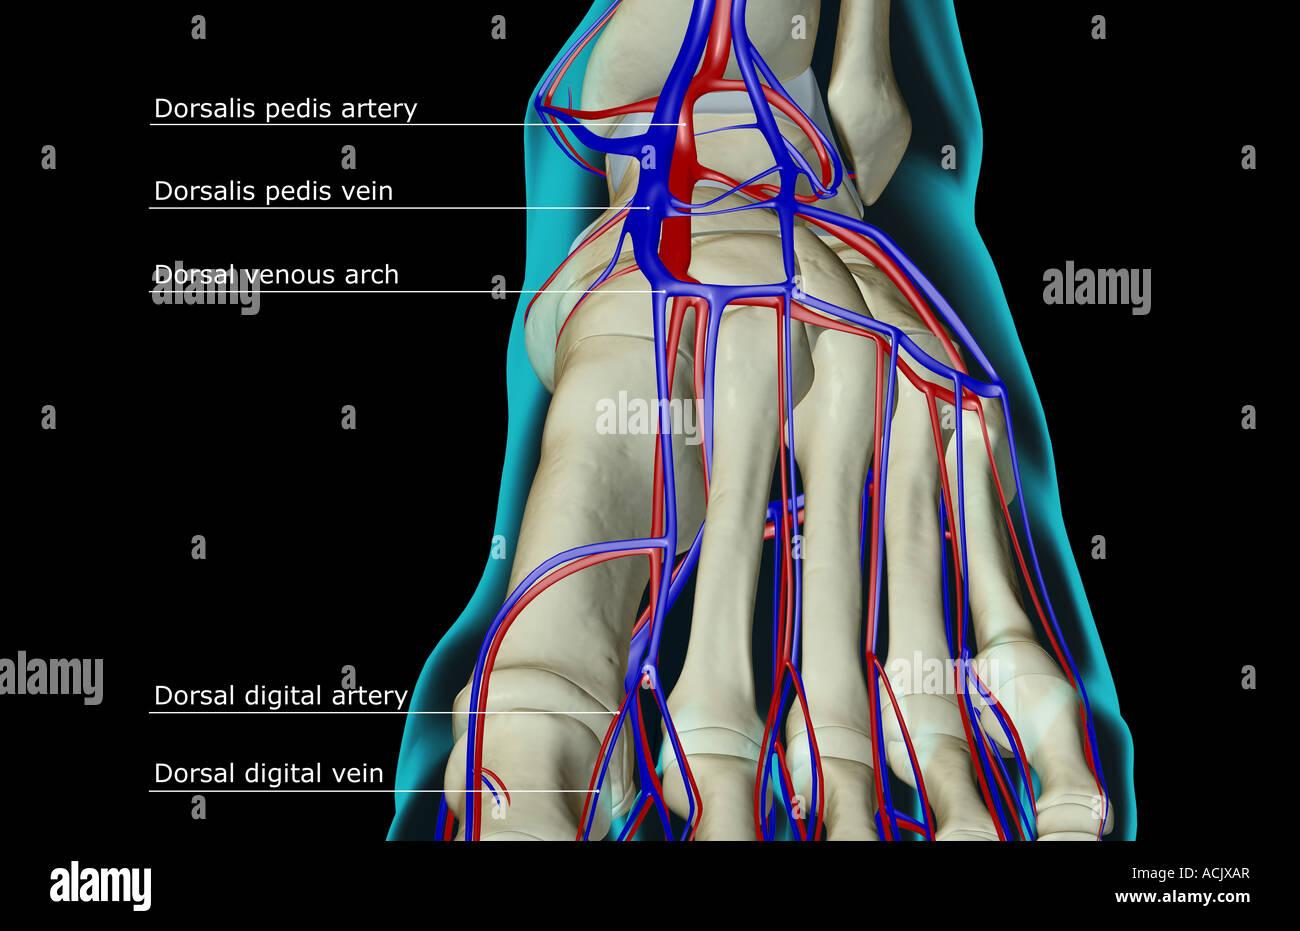 Dorsal Venous Arch Stock Photos Dorsal Venous Arch Stock Images